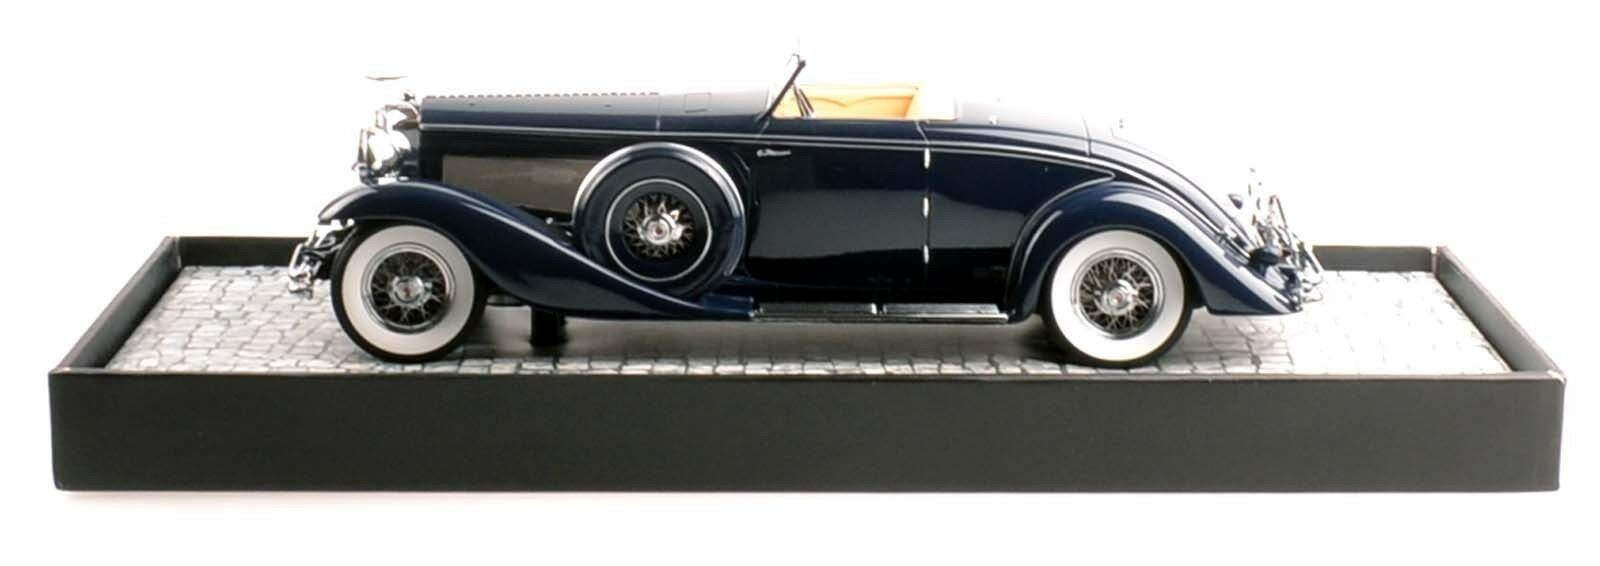 Minichamps 107150332 Duesenberg SJN converdeible coupe 1936 blu 1 18 nuevo en el embalaje original